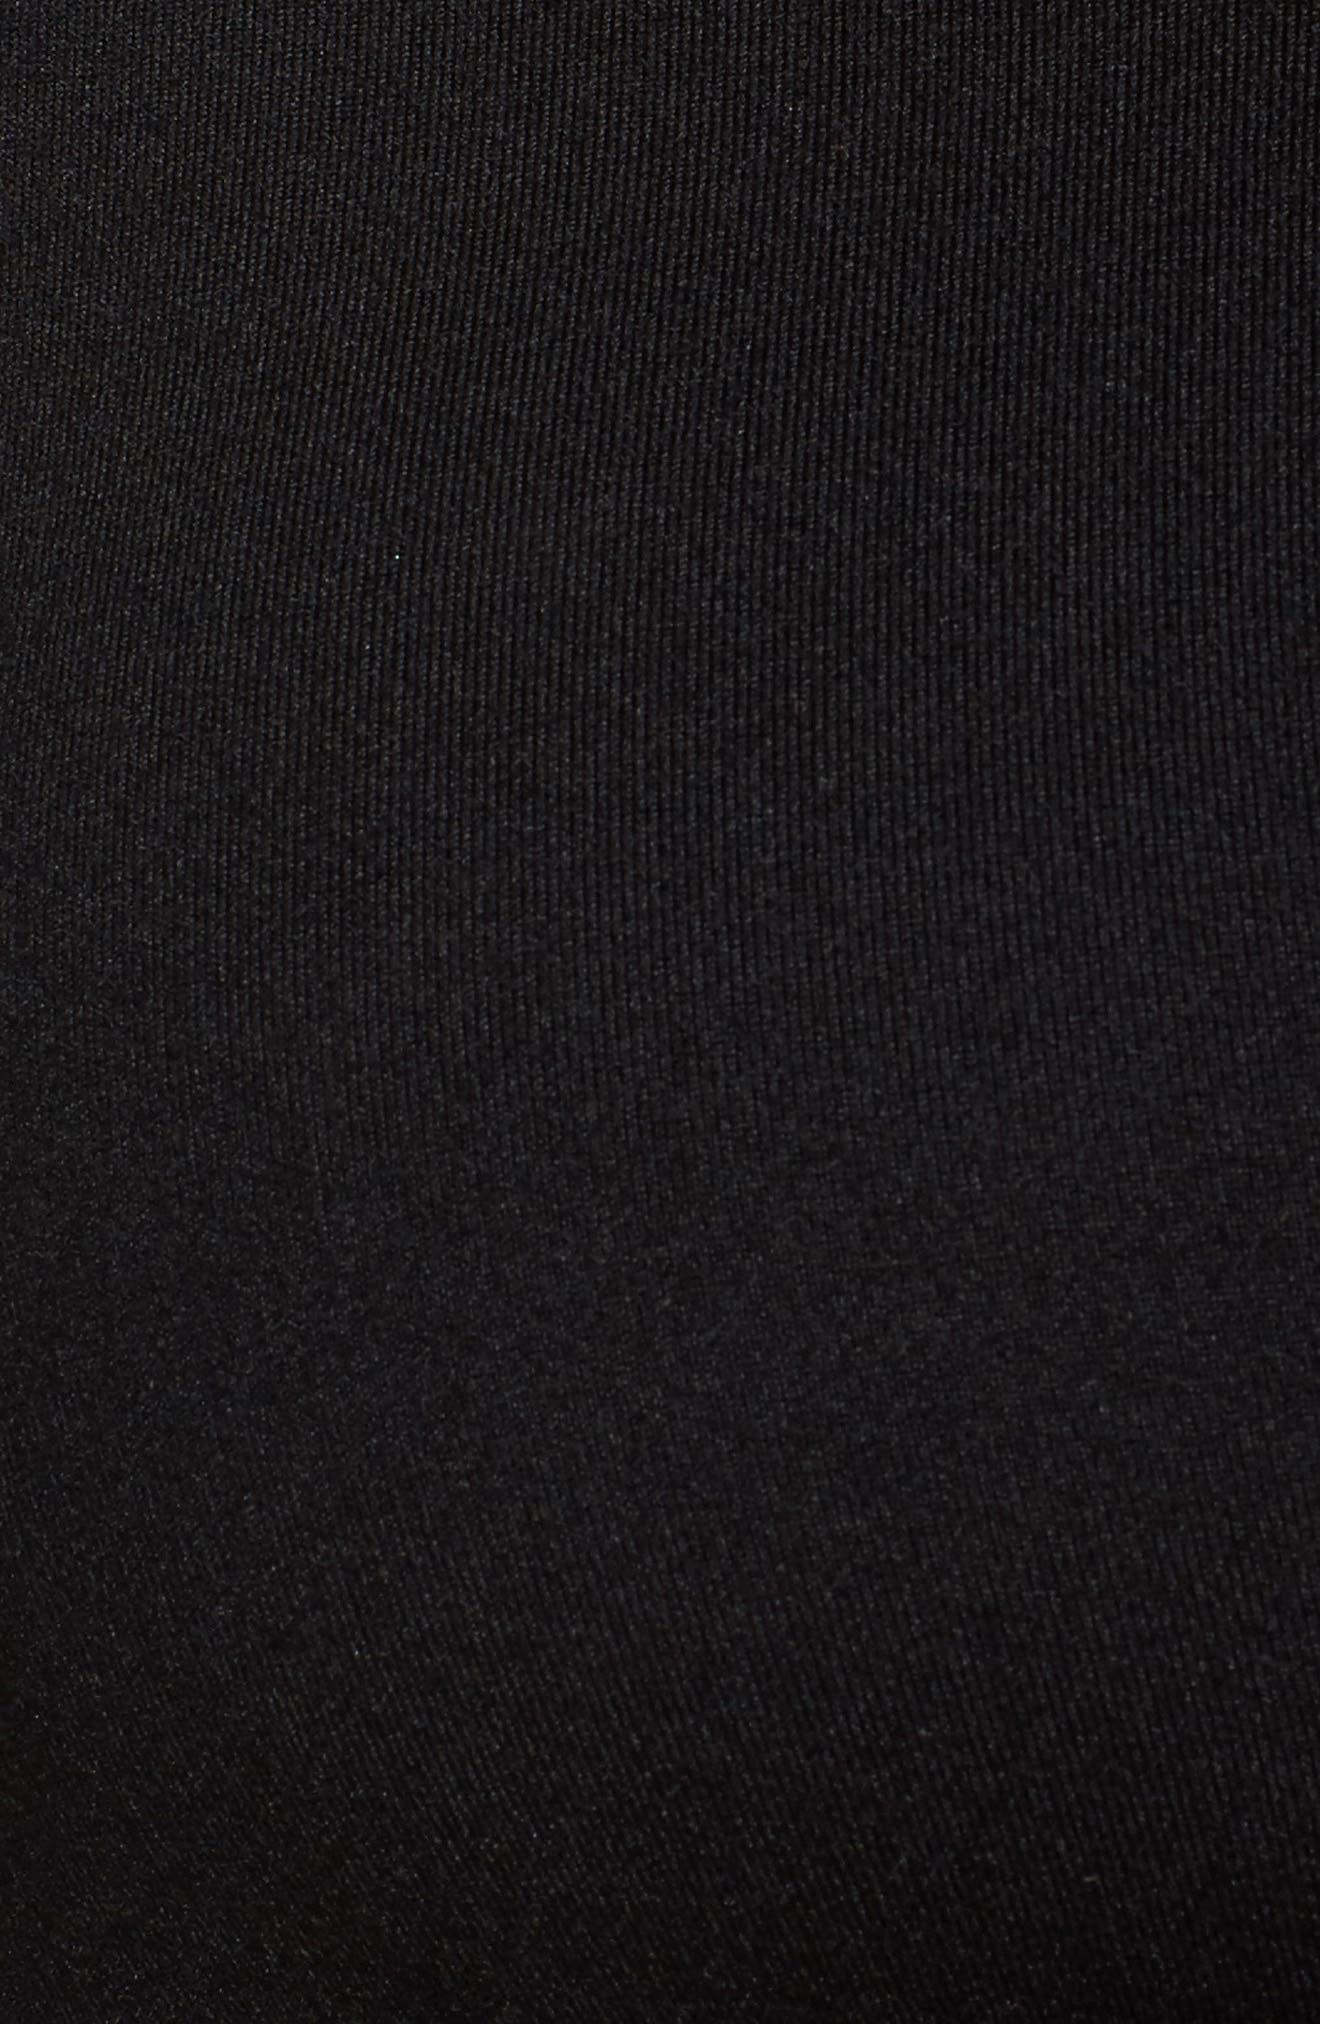 Harness Sports Bra,                             Alternate thumbnail 6, color,                             Black